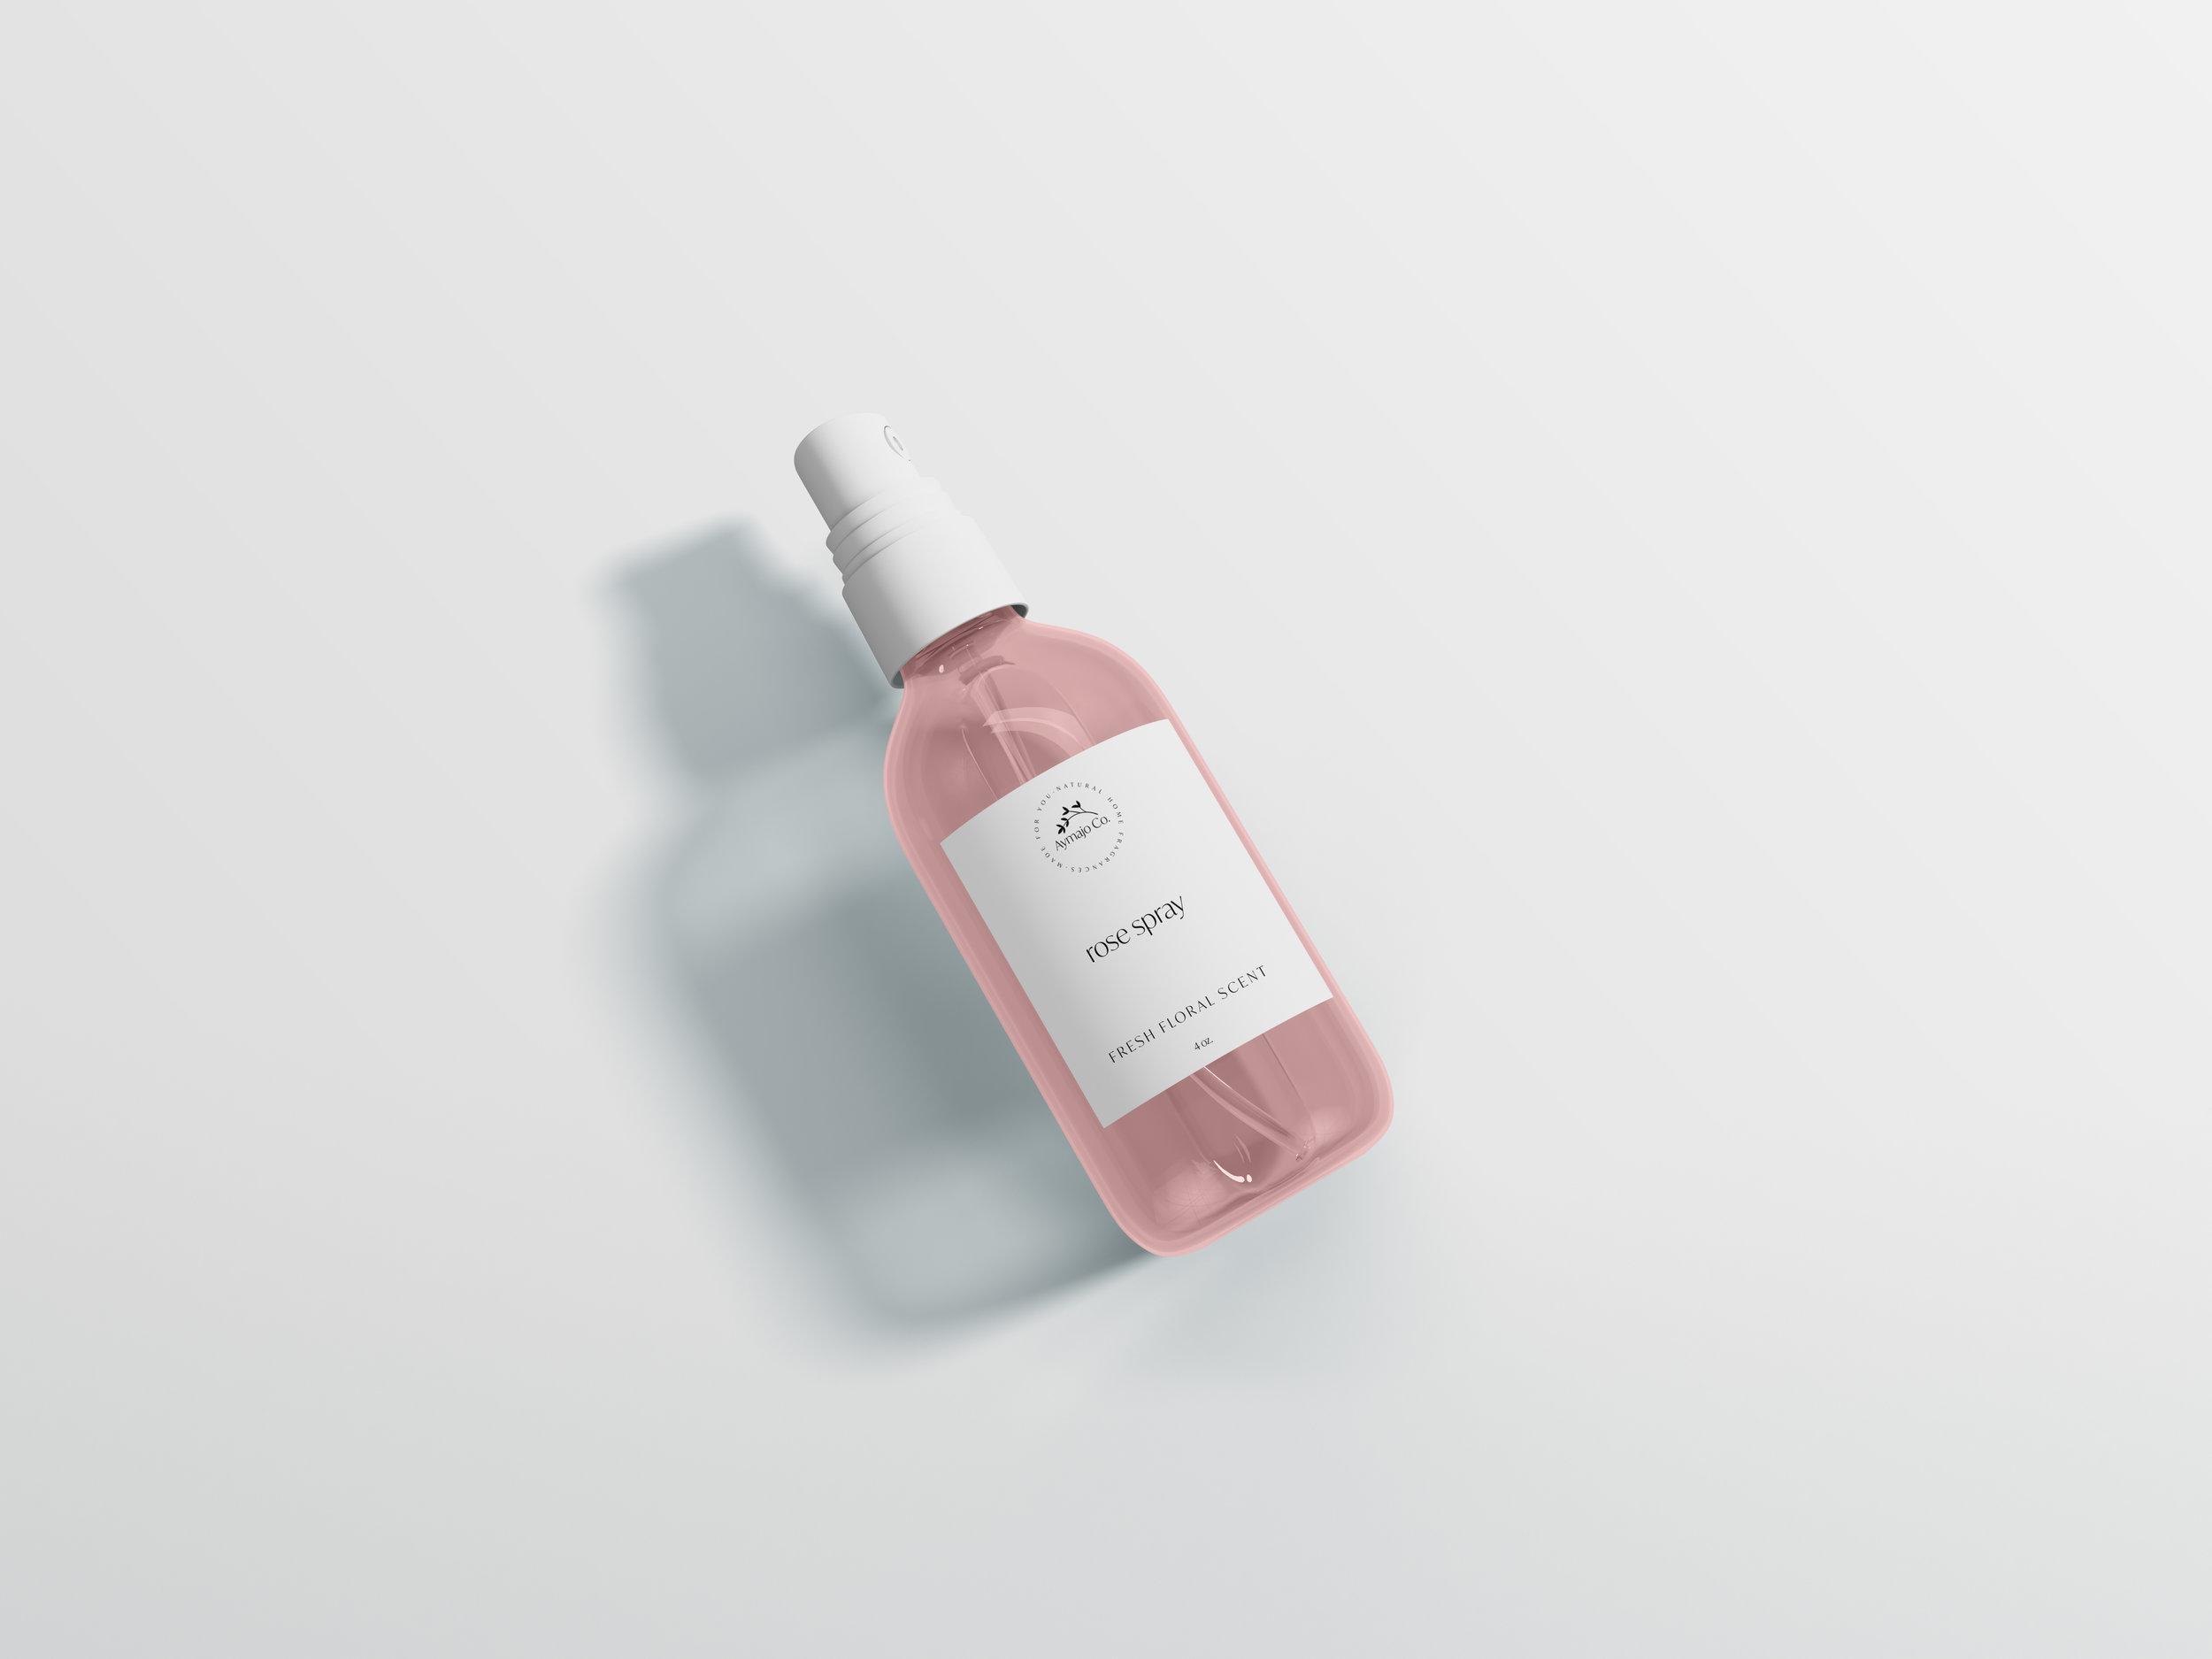 Aymajo Spray Bottle Label.jpg